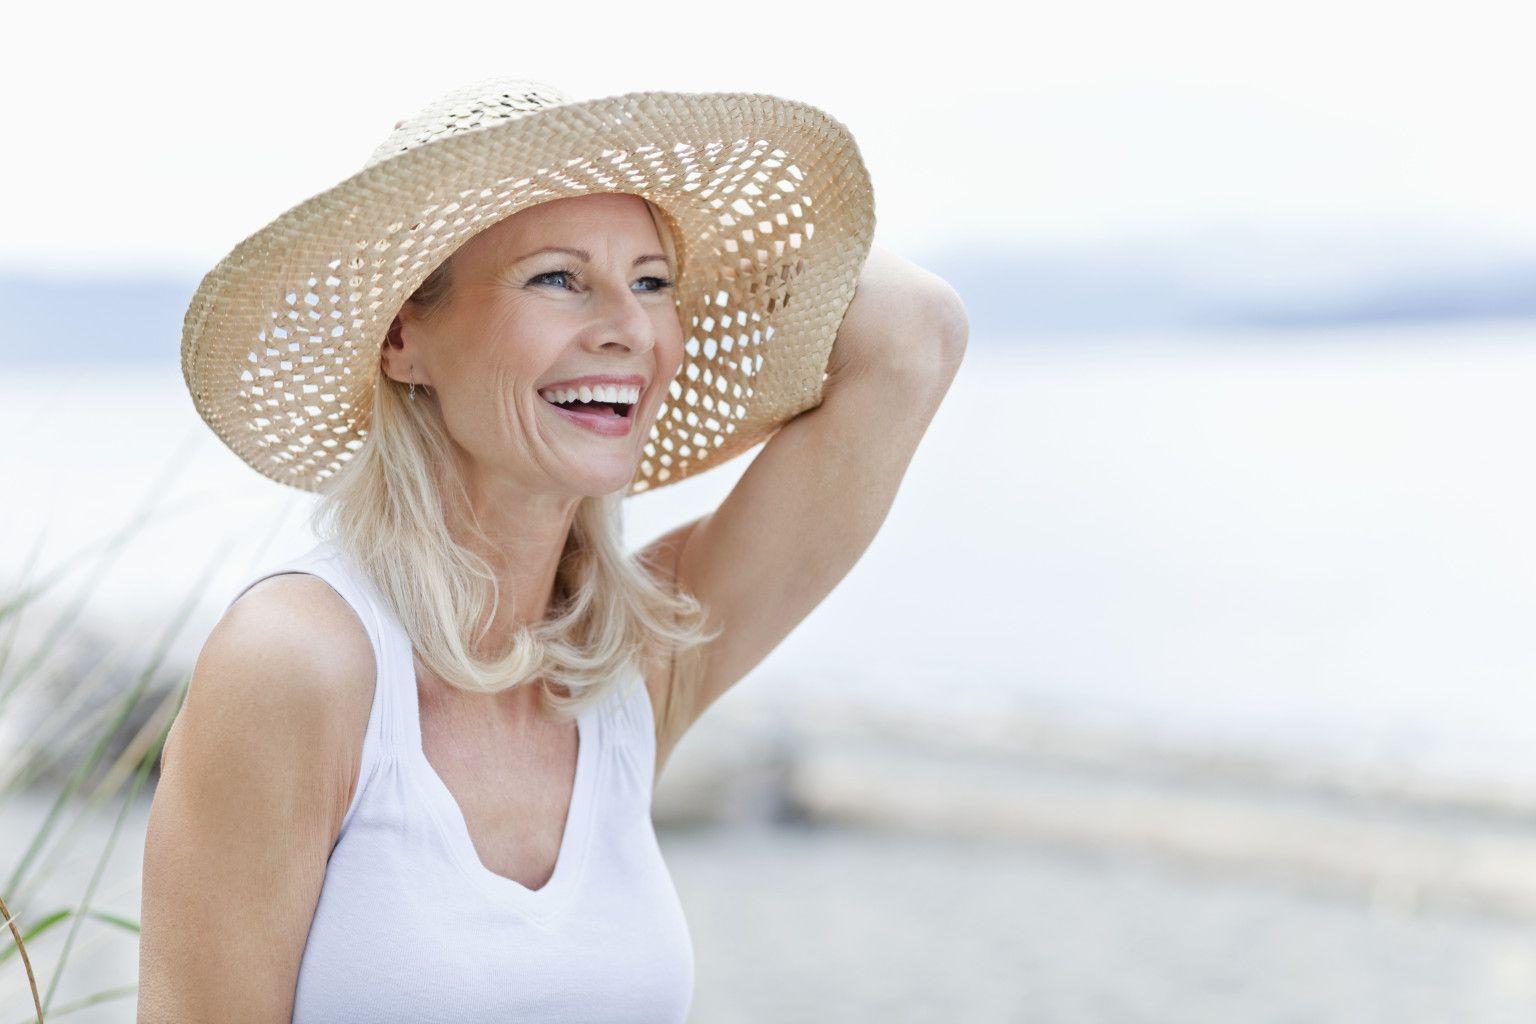 Mujer menopausia en la playa